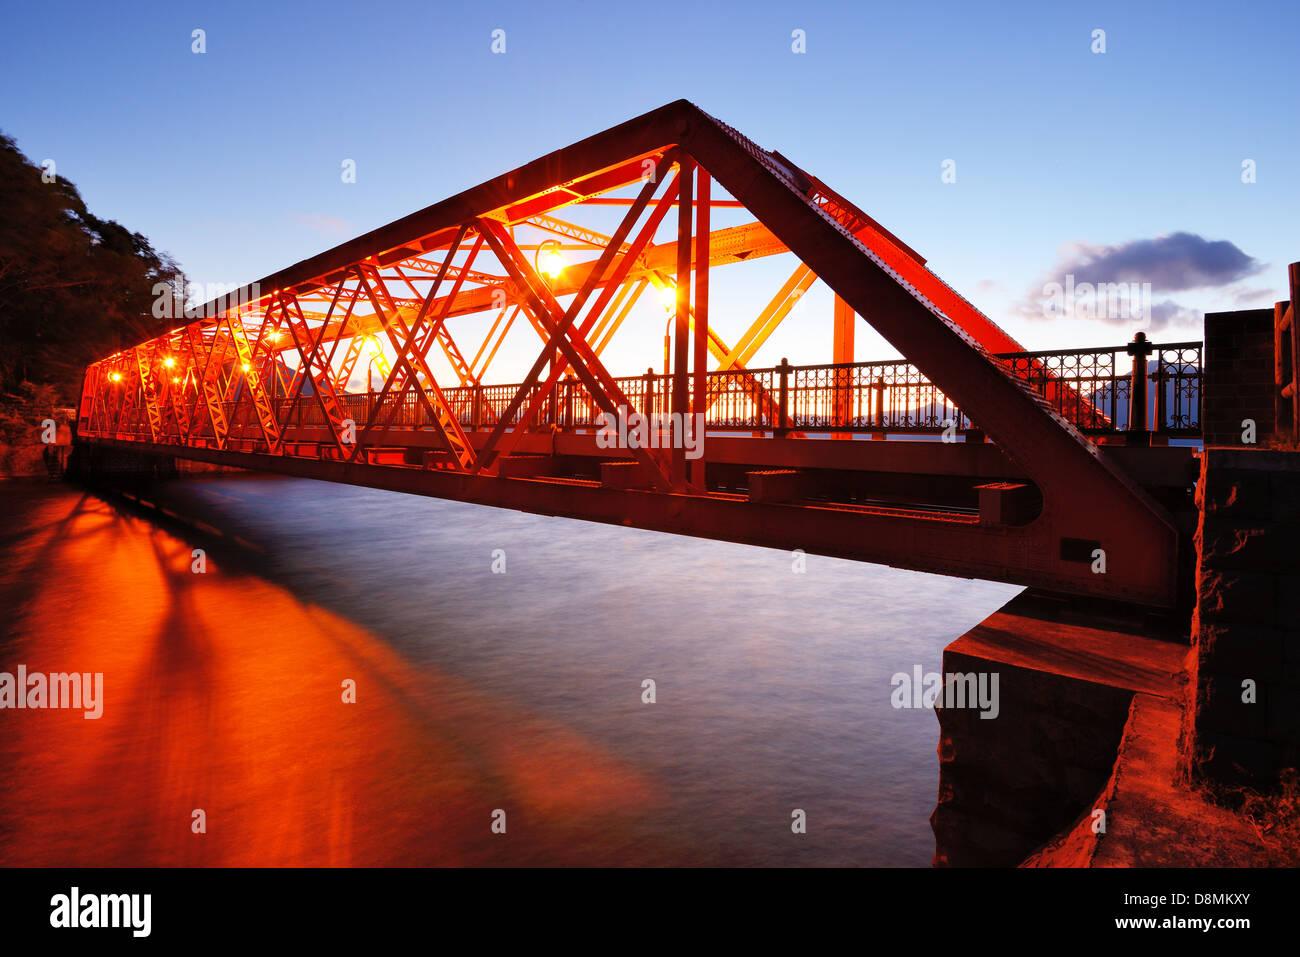 Sansen Bridge spanning Shikotsu Lake in the northern Island of Hokkaido, Japan. - Stock Image